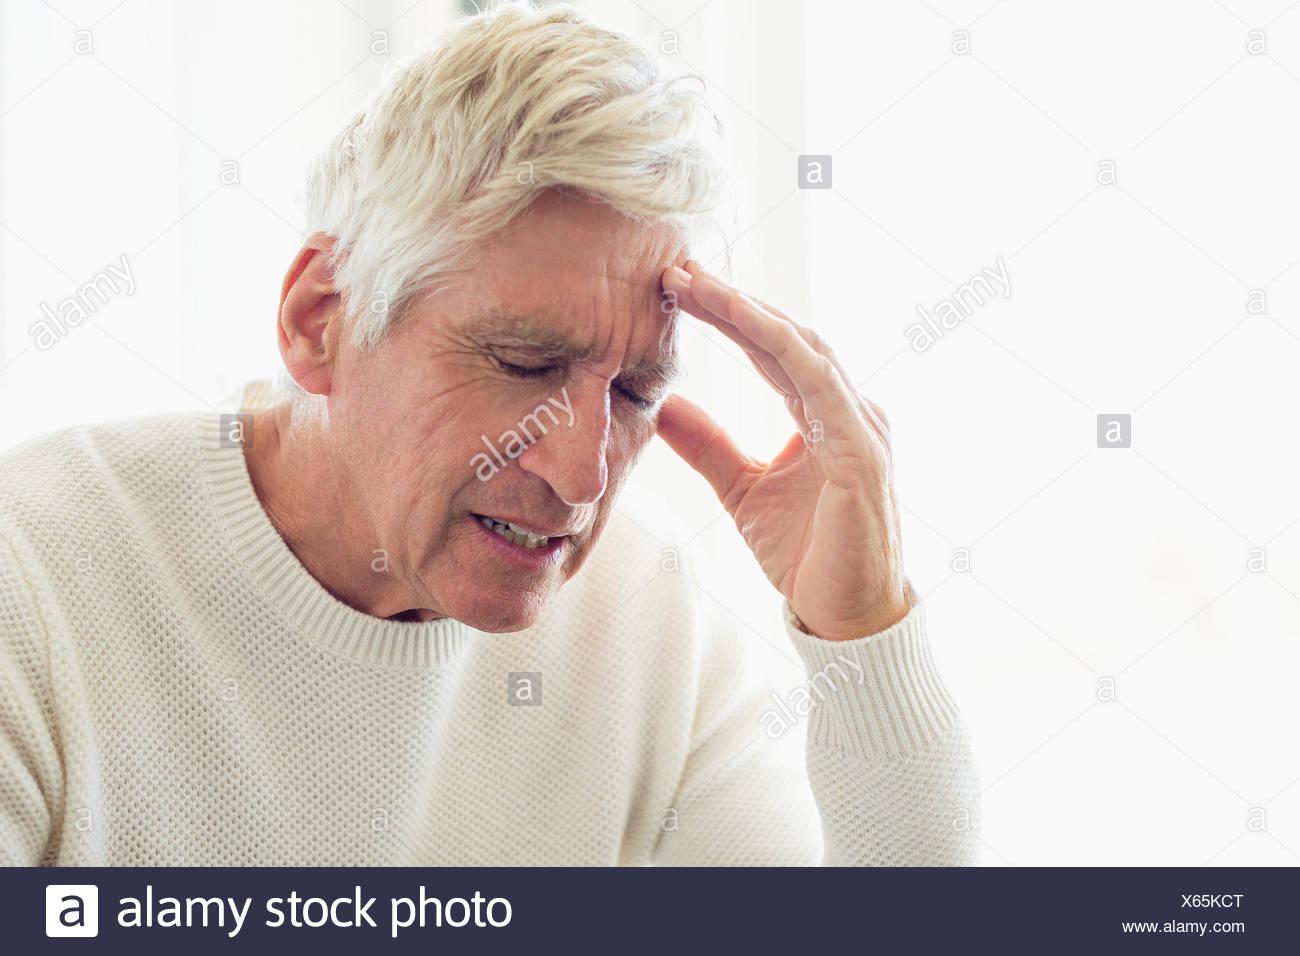 Senior man suffering from headache - Stock Image